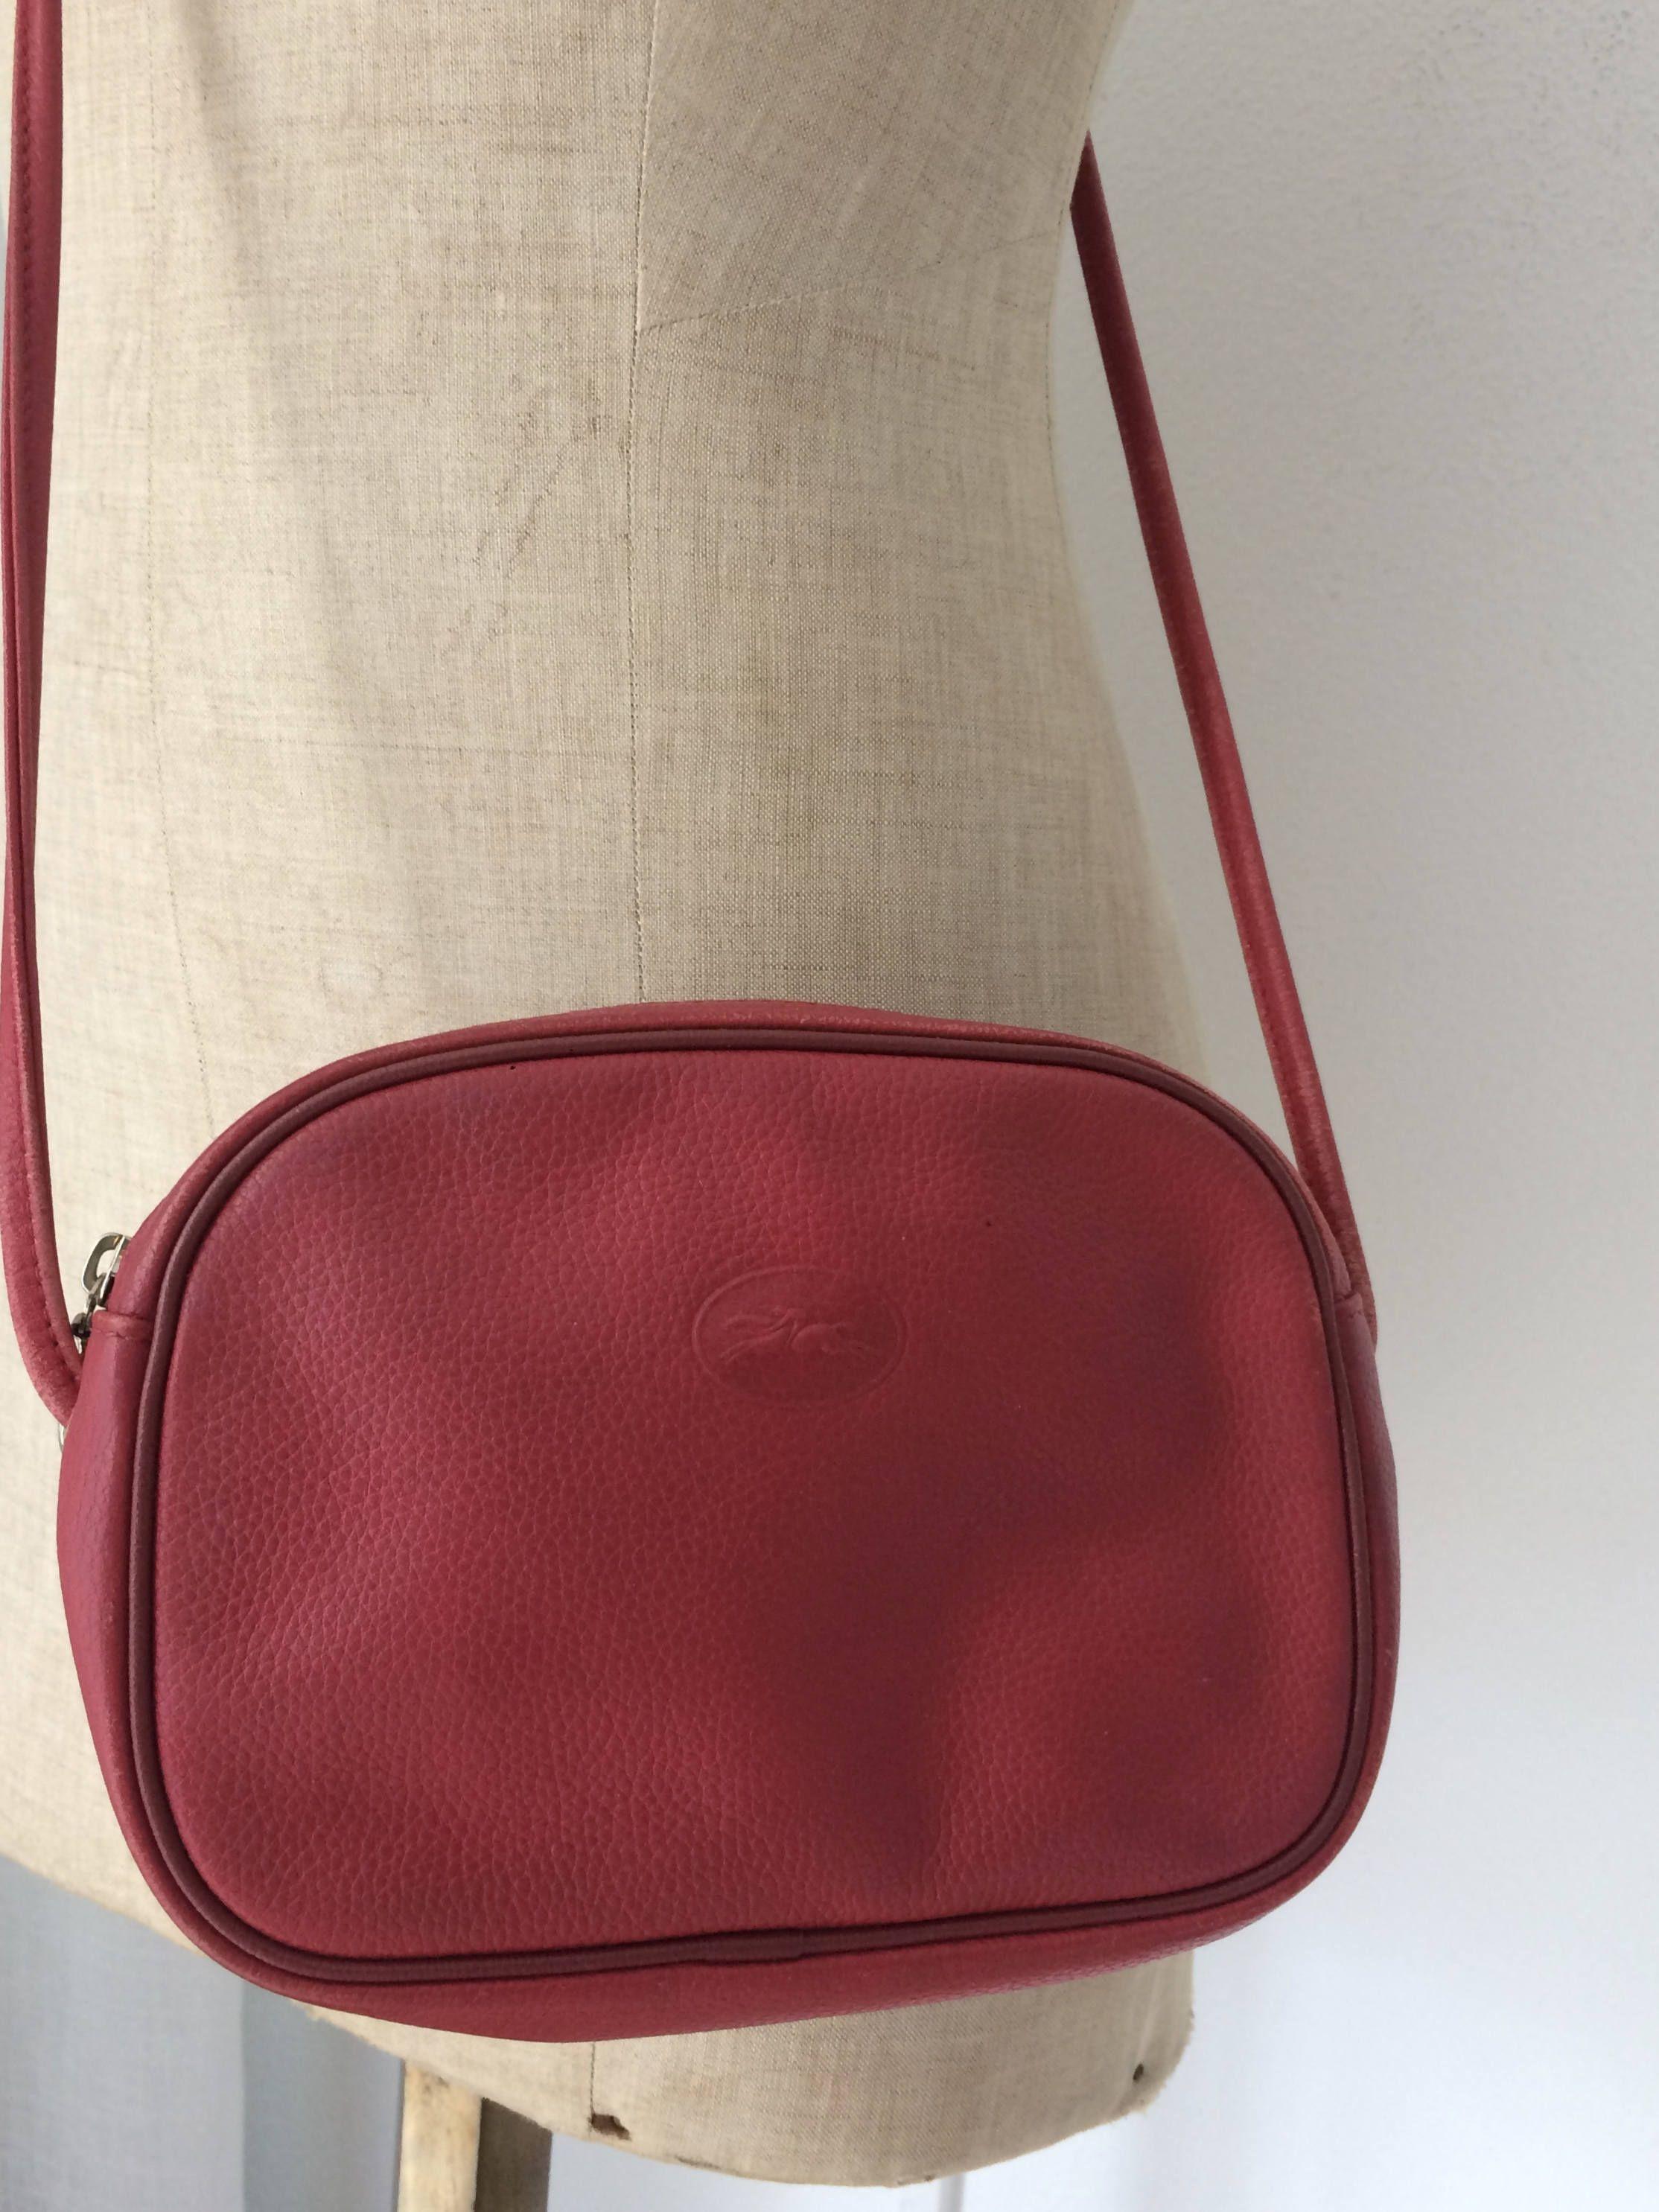 0352b73c8726 Vintage beautiful Longchamp red shoulderbag crossbody bag by  MORETHANVINTAGENL on Etsy